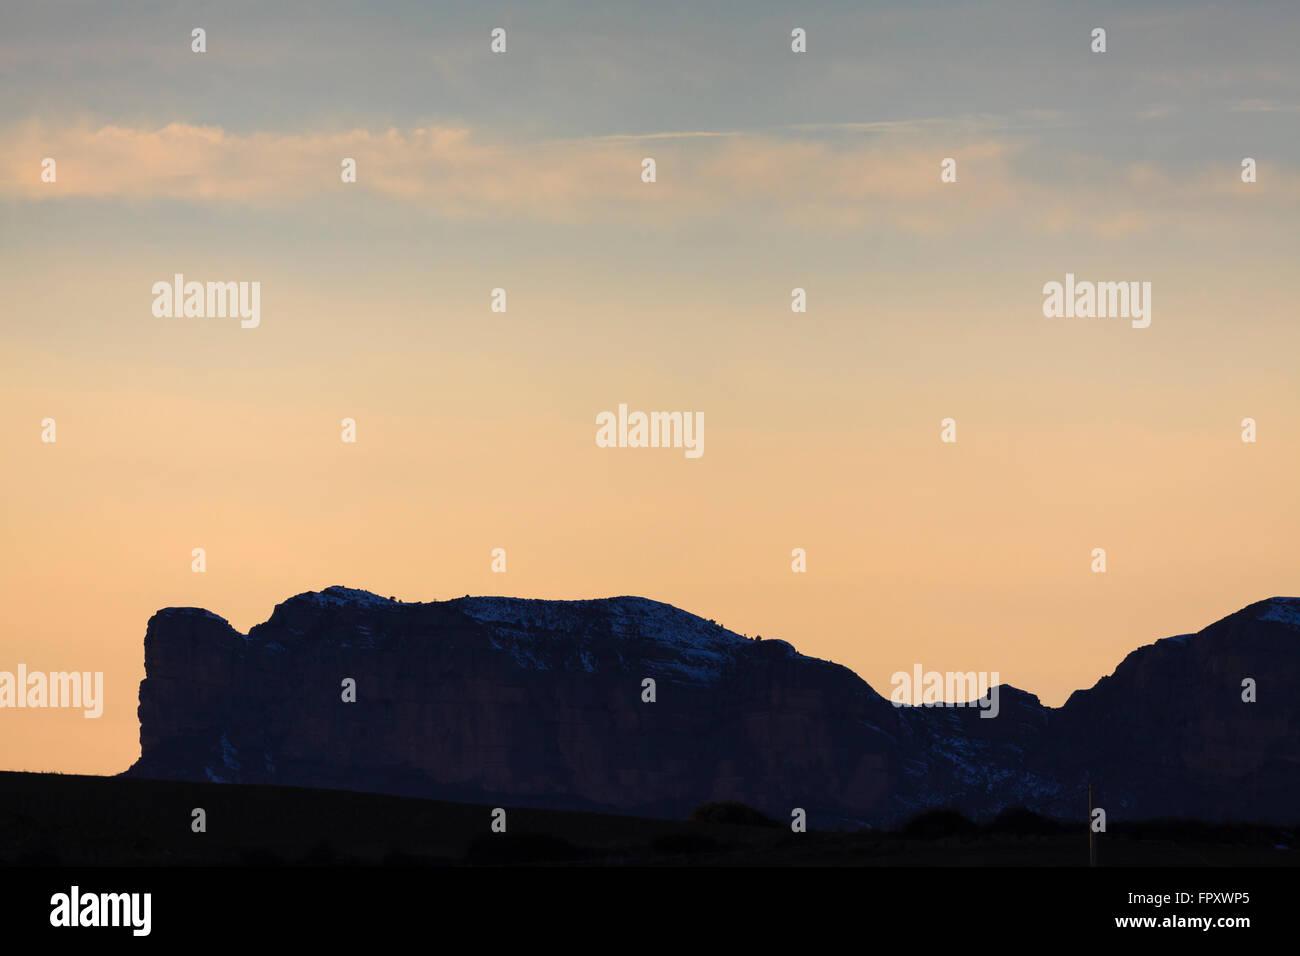 Sierra de Cis at dusk. Pre-Pyrenees. Huesca province. Aragon. Spain. - Stock Image